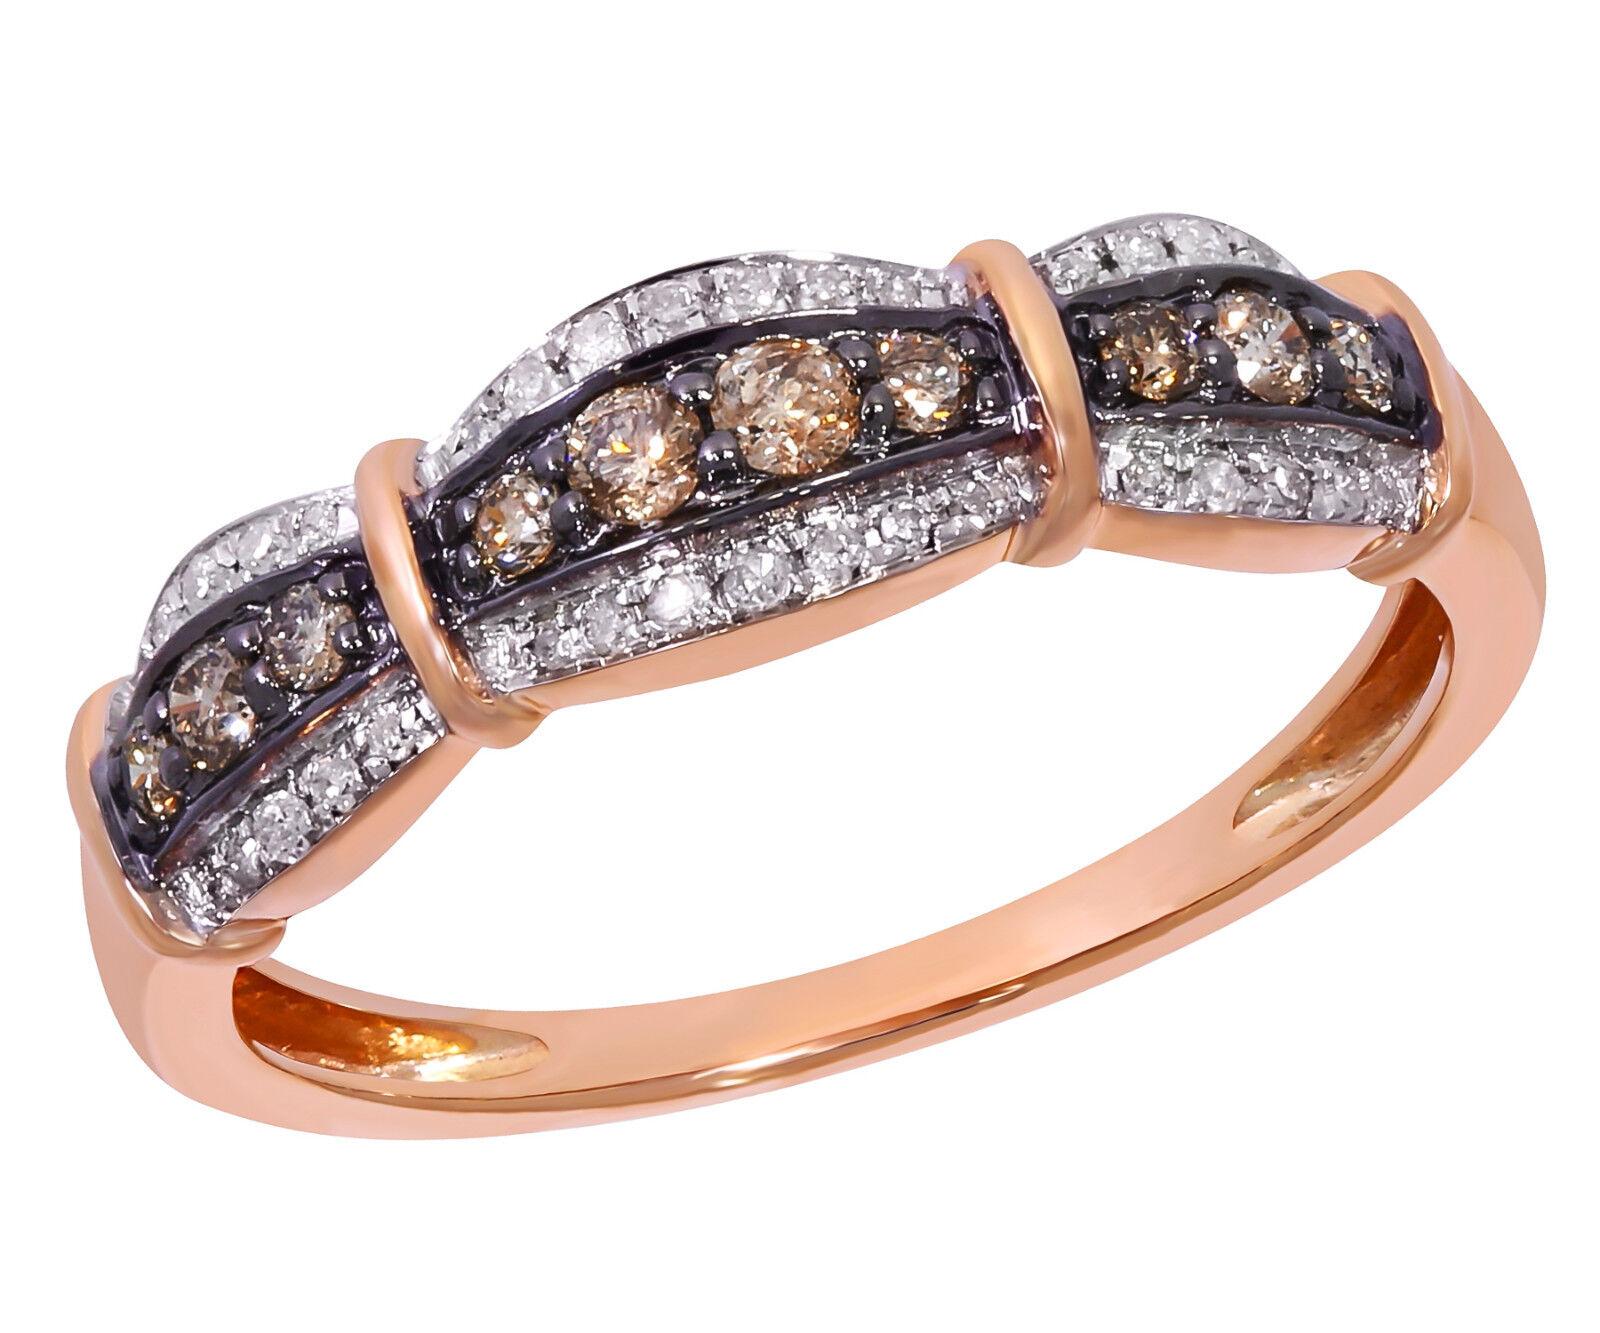 Prism Jewel 0.31Ct Round Cut Brown color Diamond with Diamond Anniversary Ring